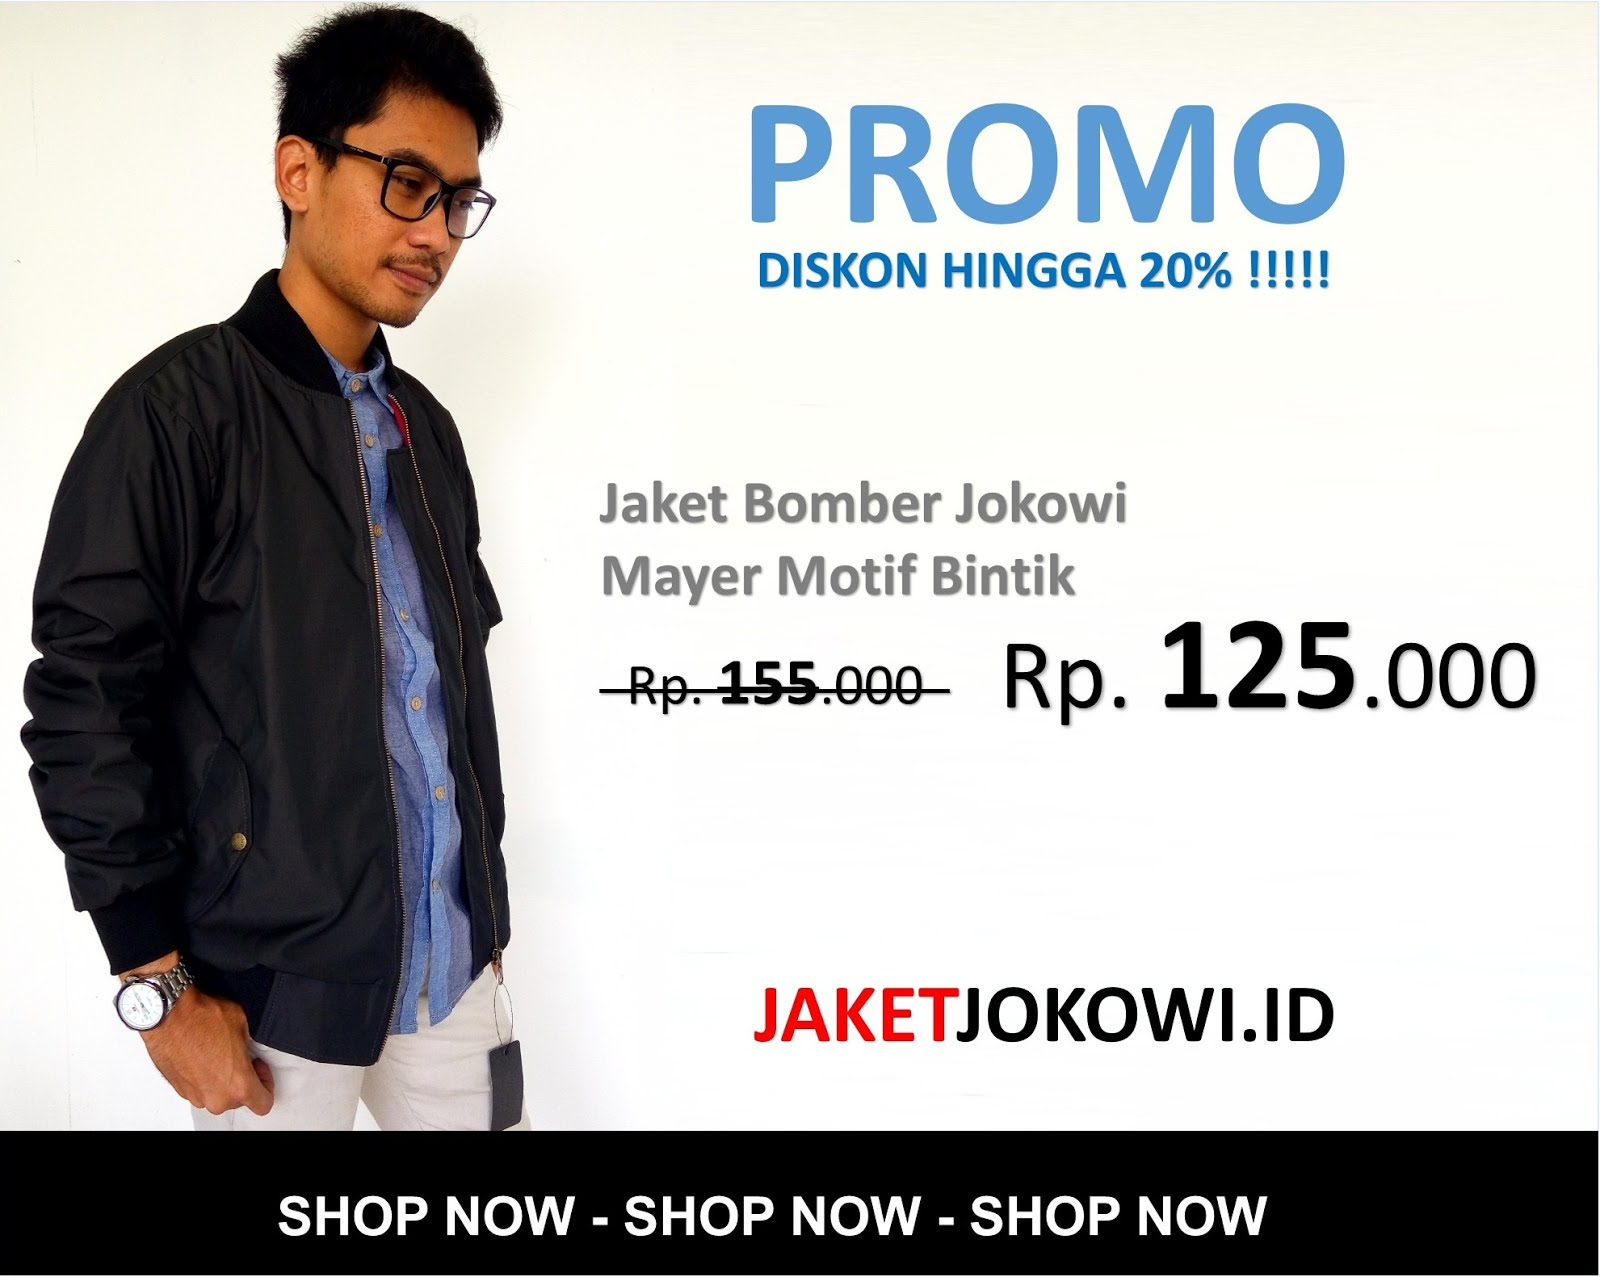 Jaket Bomber Jokowi Keren